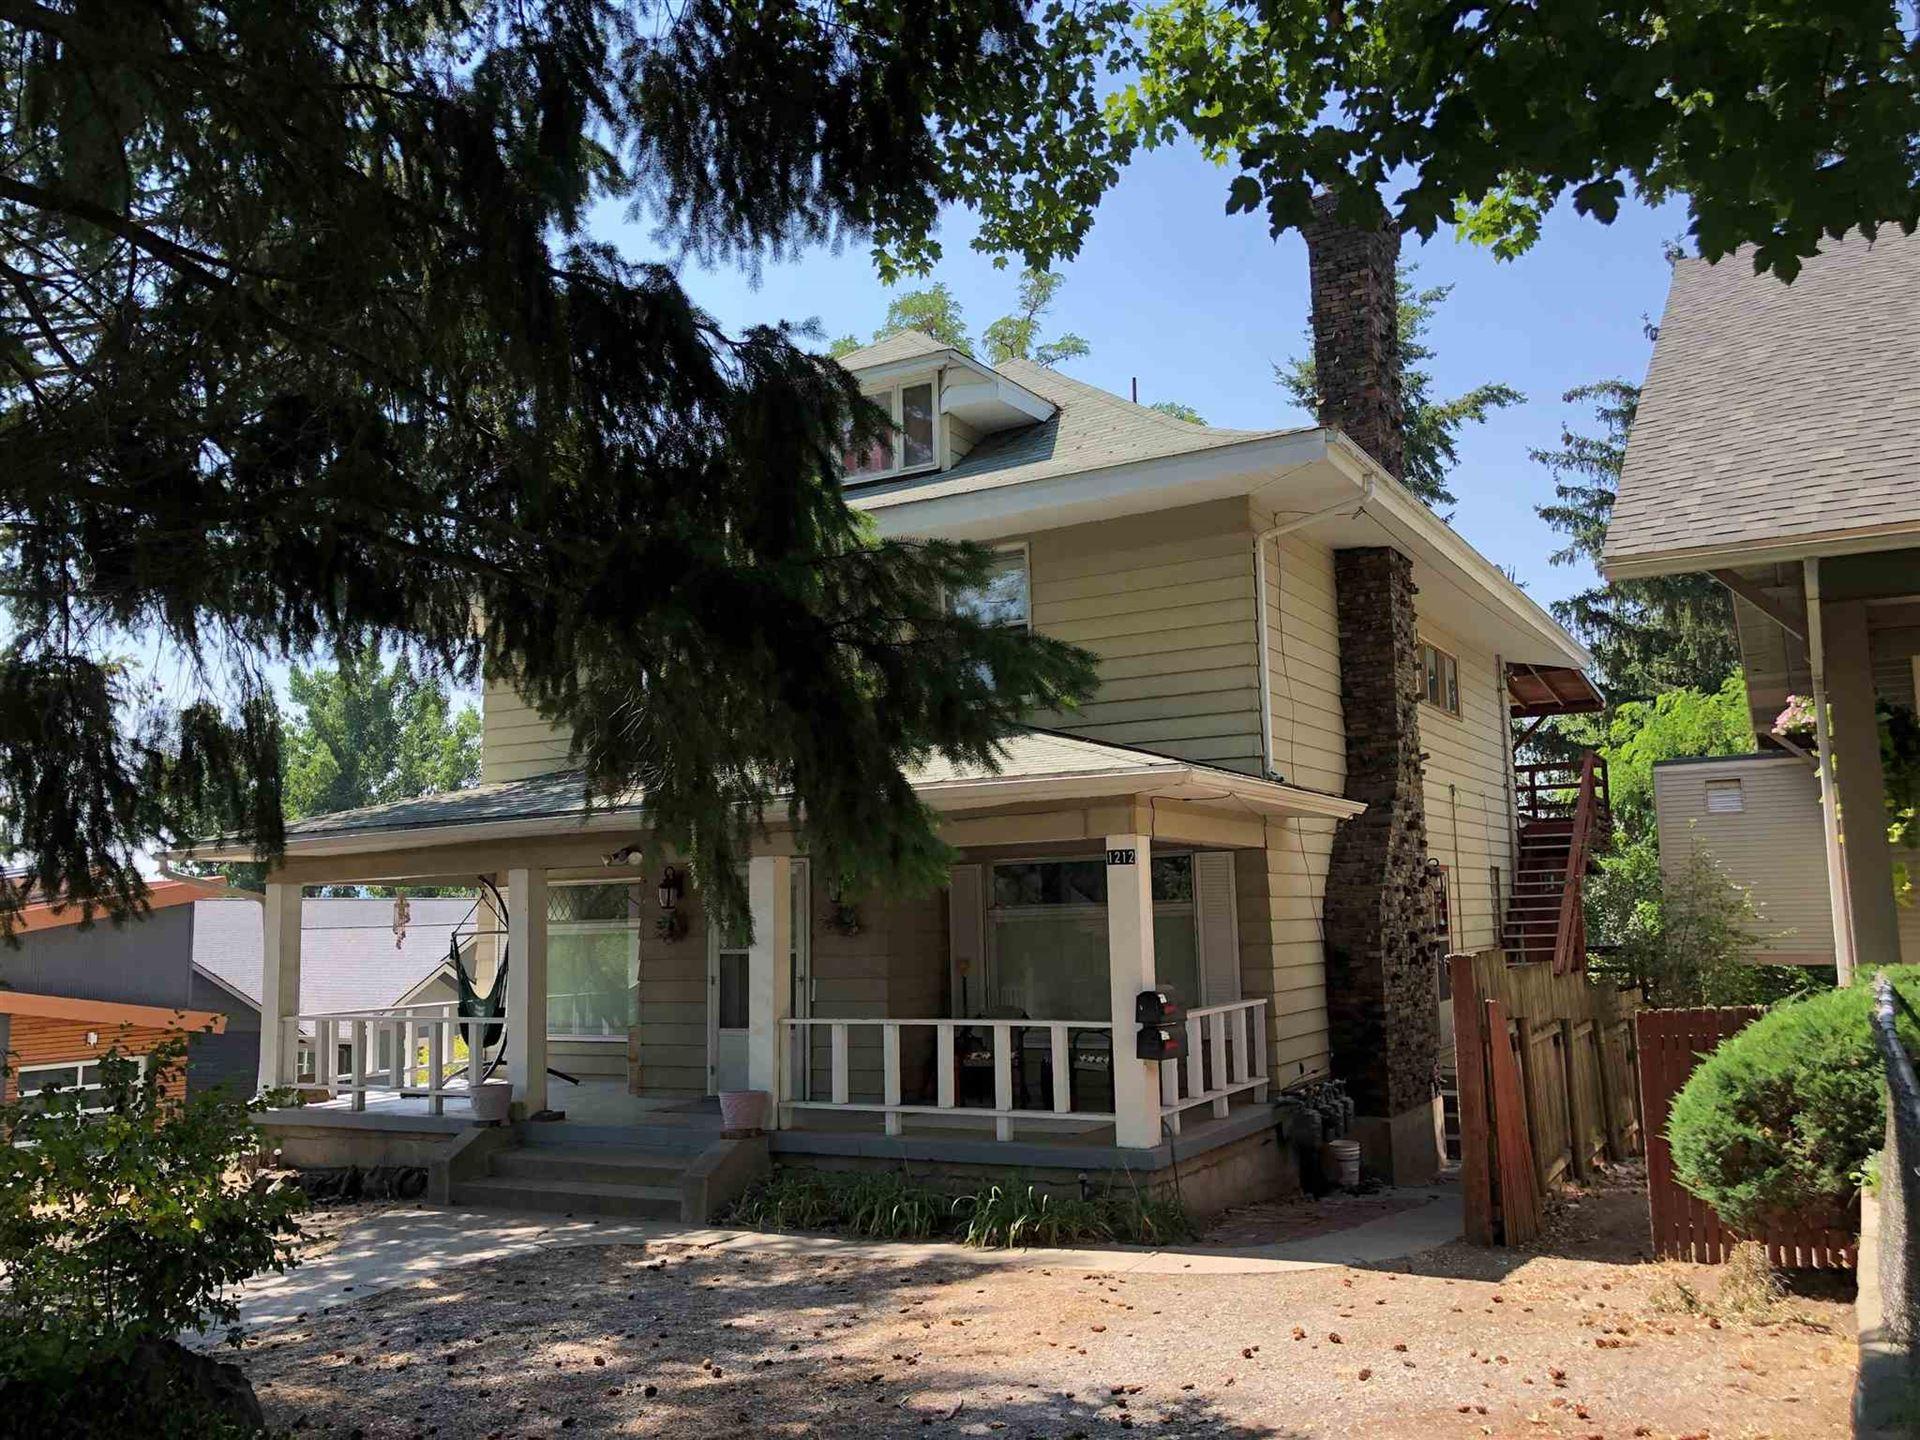 1212 S Oak St, Spokane, WA 99204 - #: 202120562